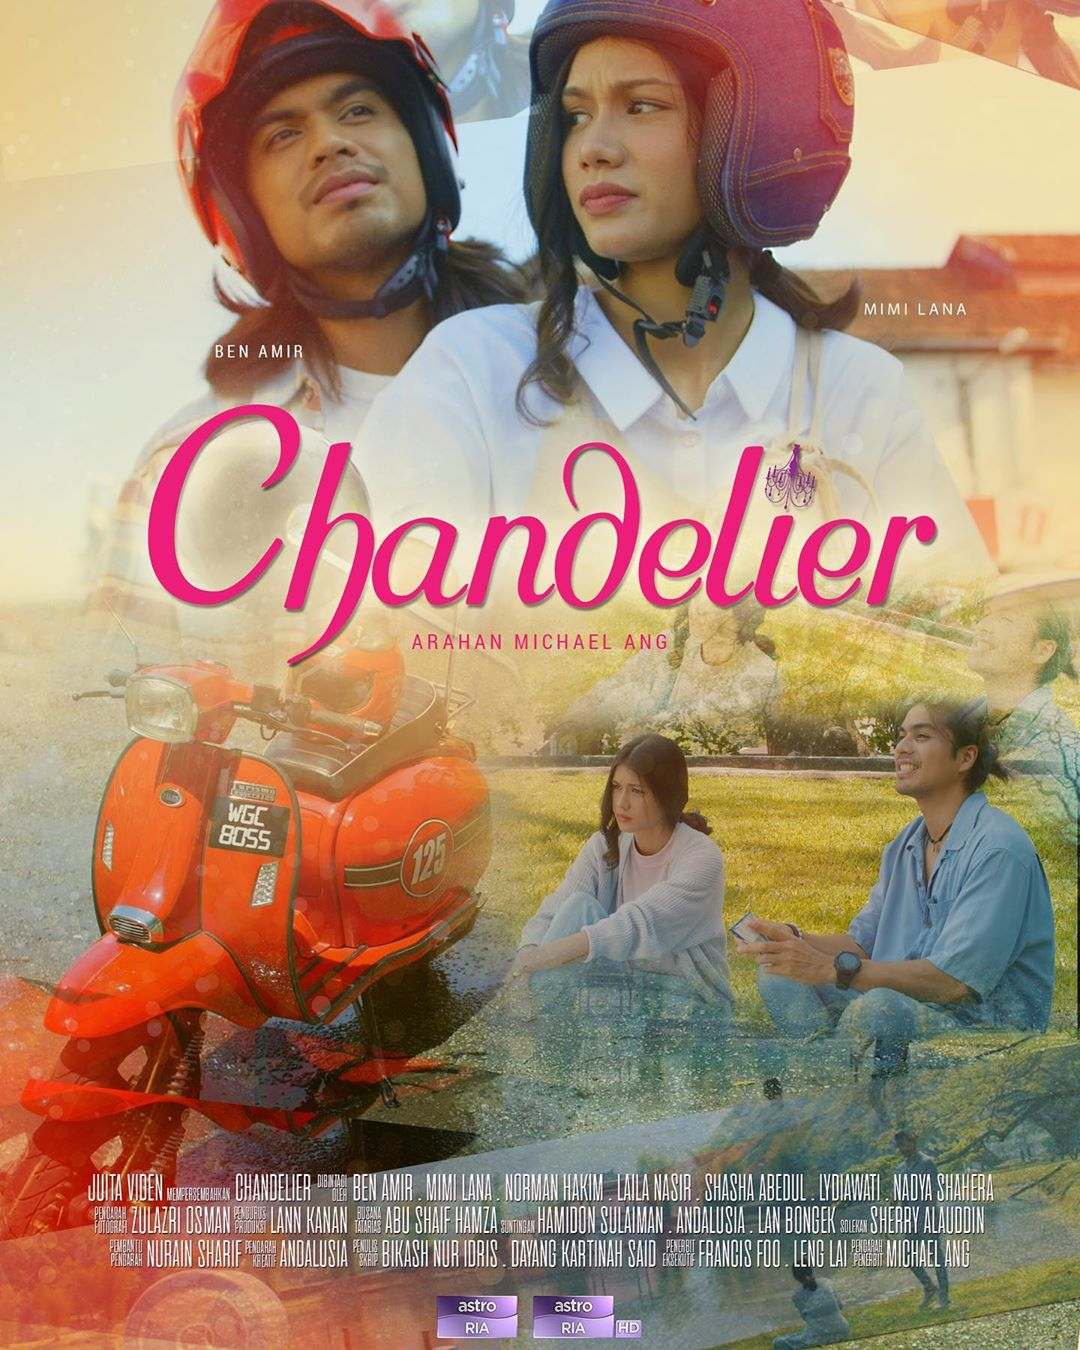 Drama Chandelier